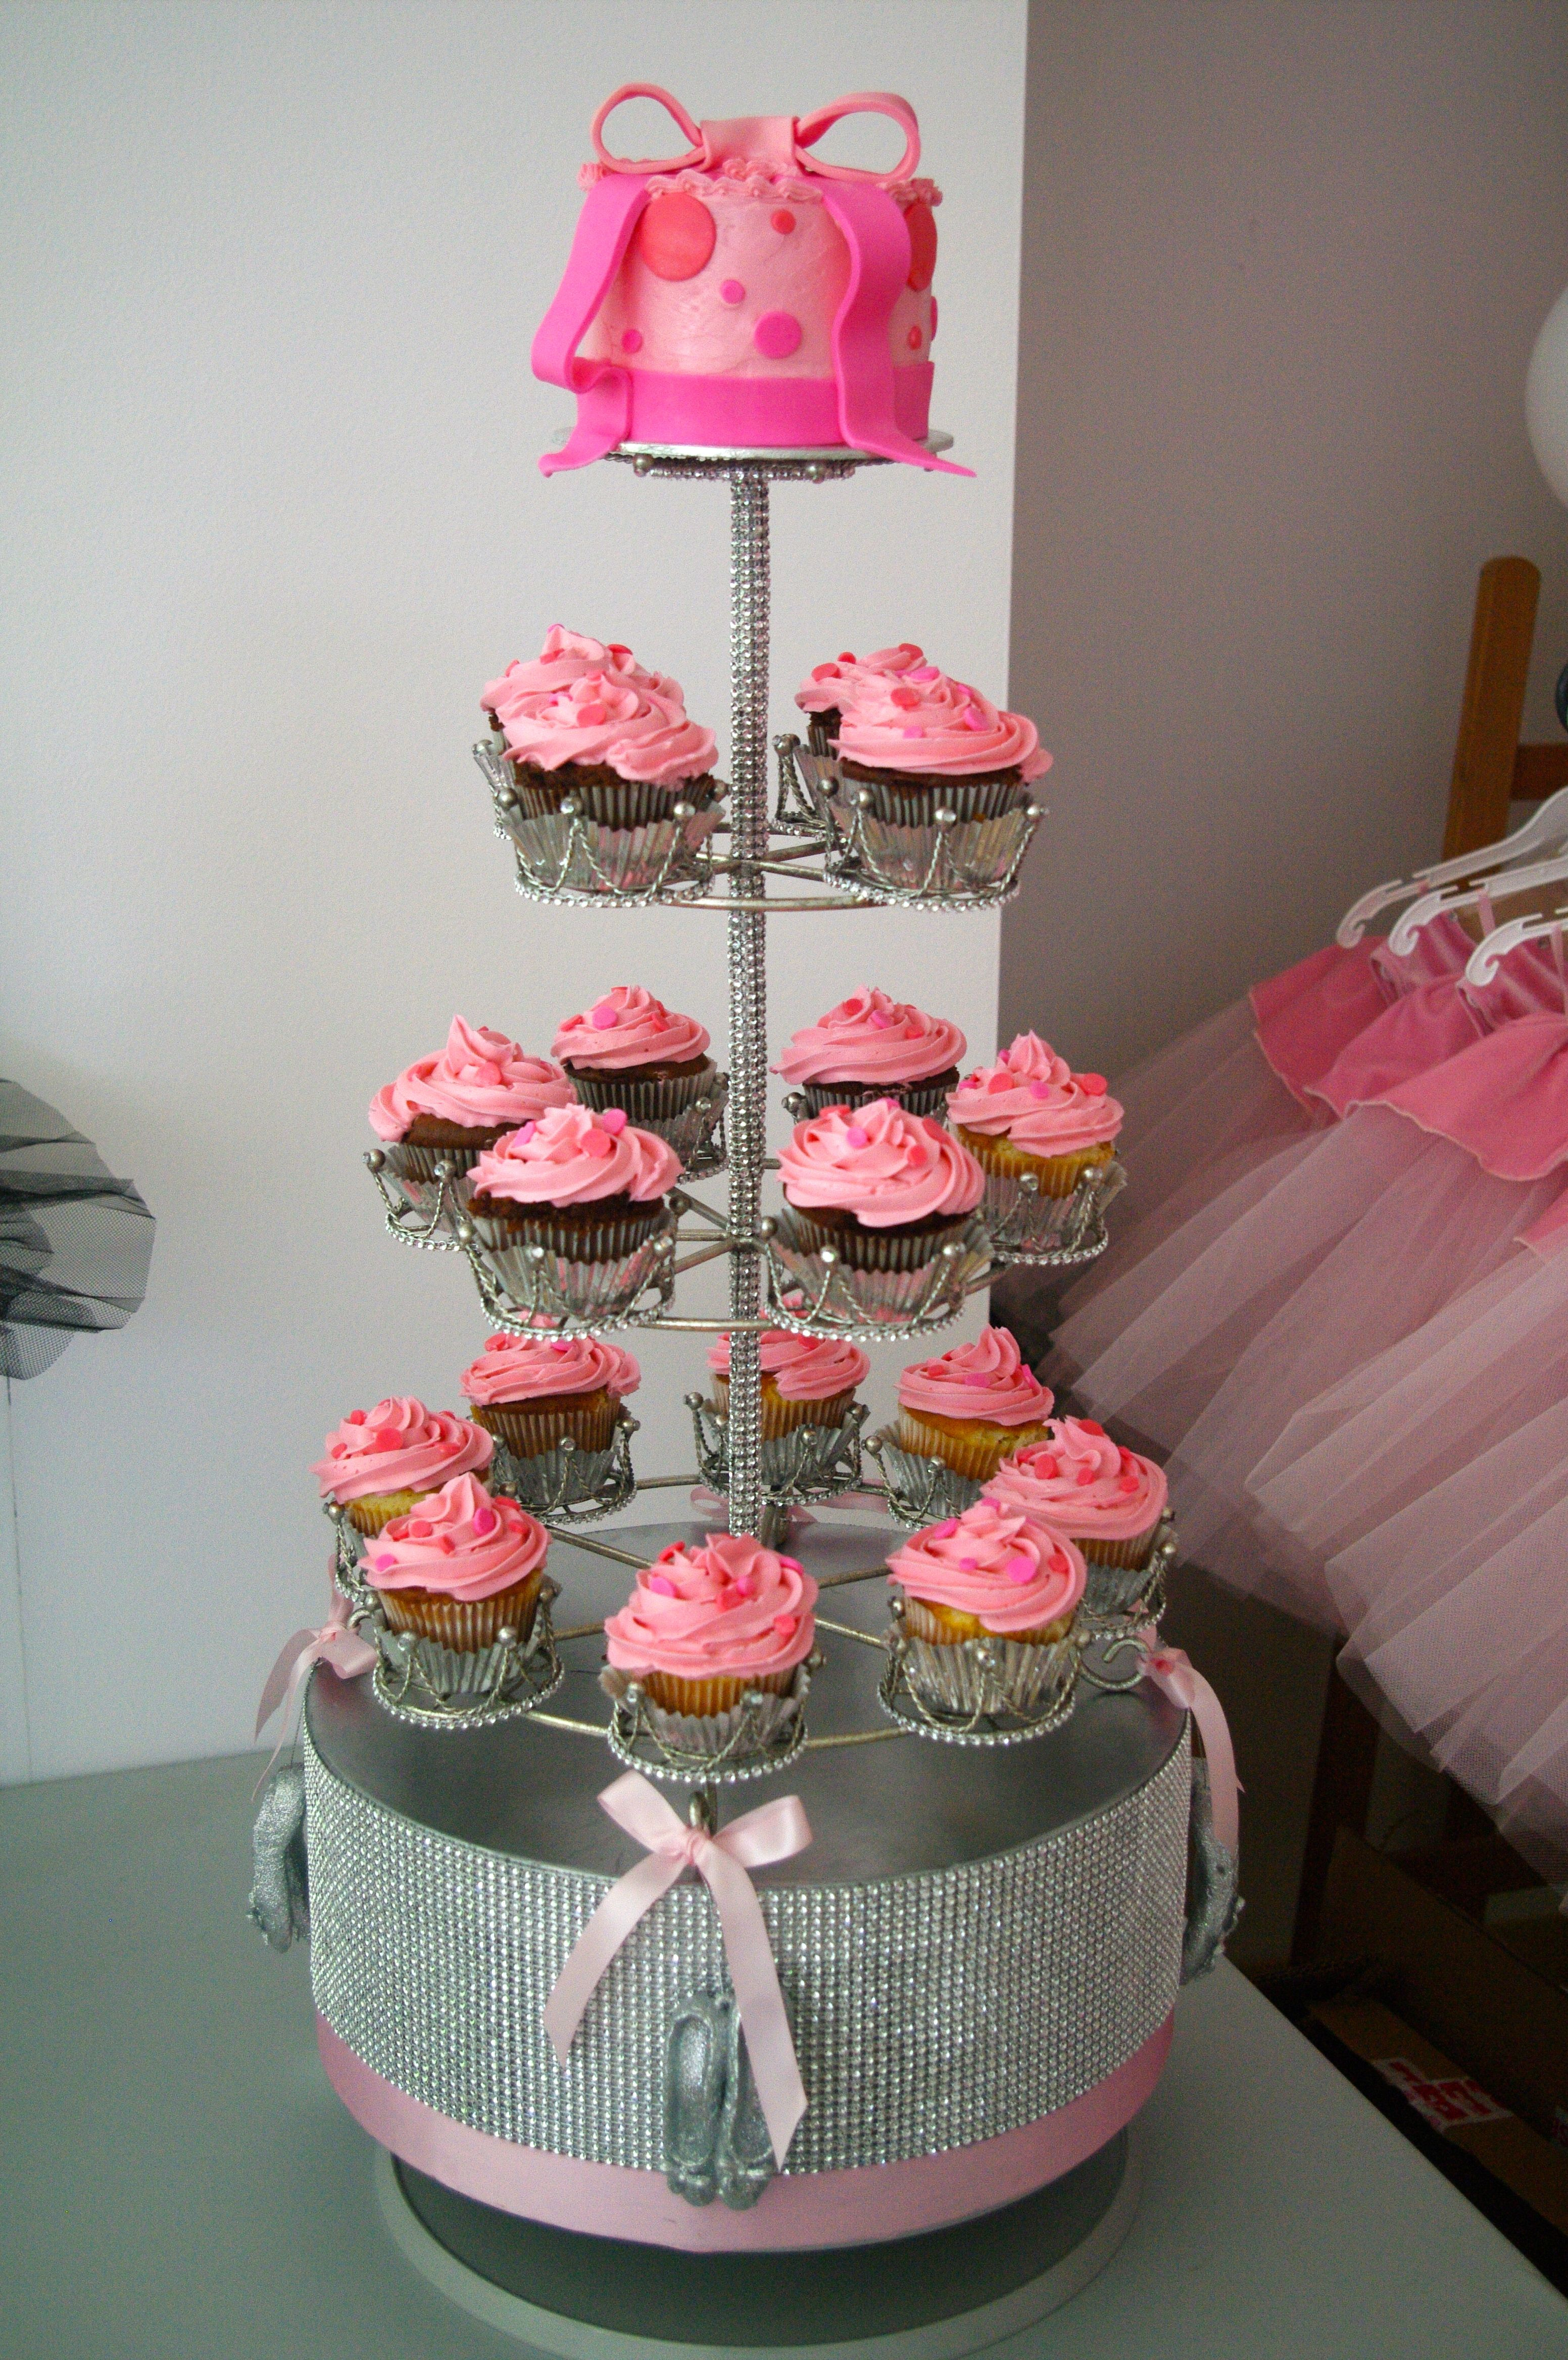 Ballet Birthday Cake with Vanilla & Chocolate Cupcakes